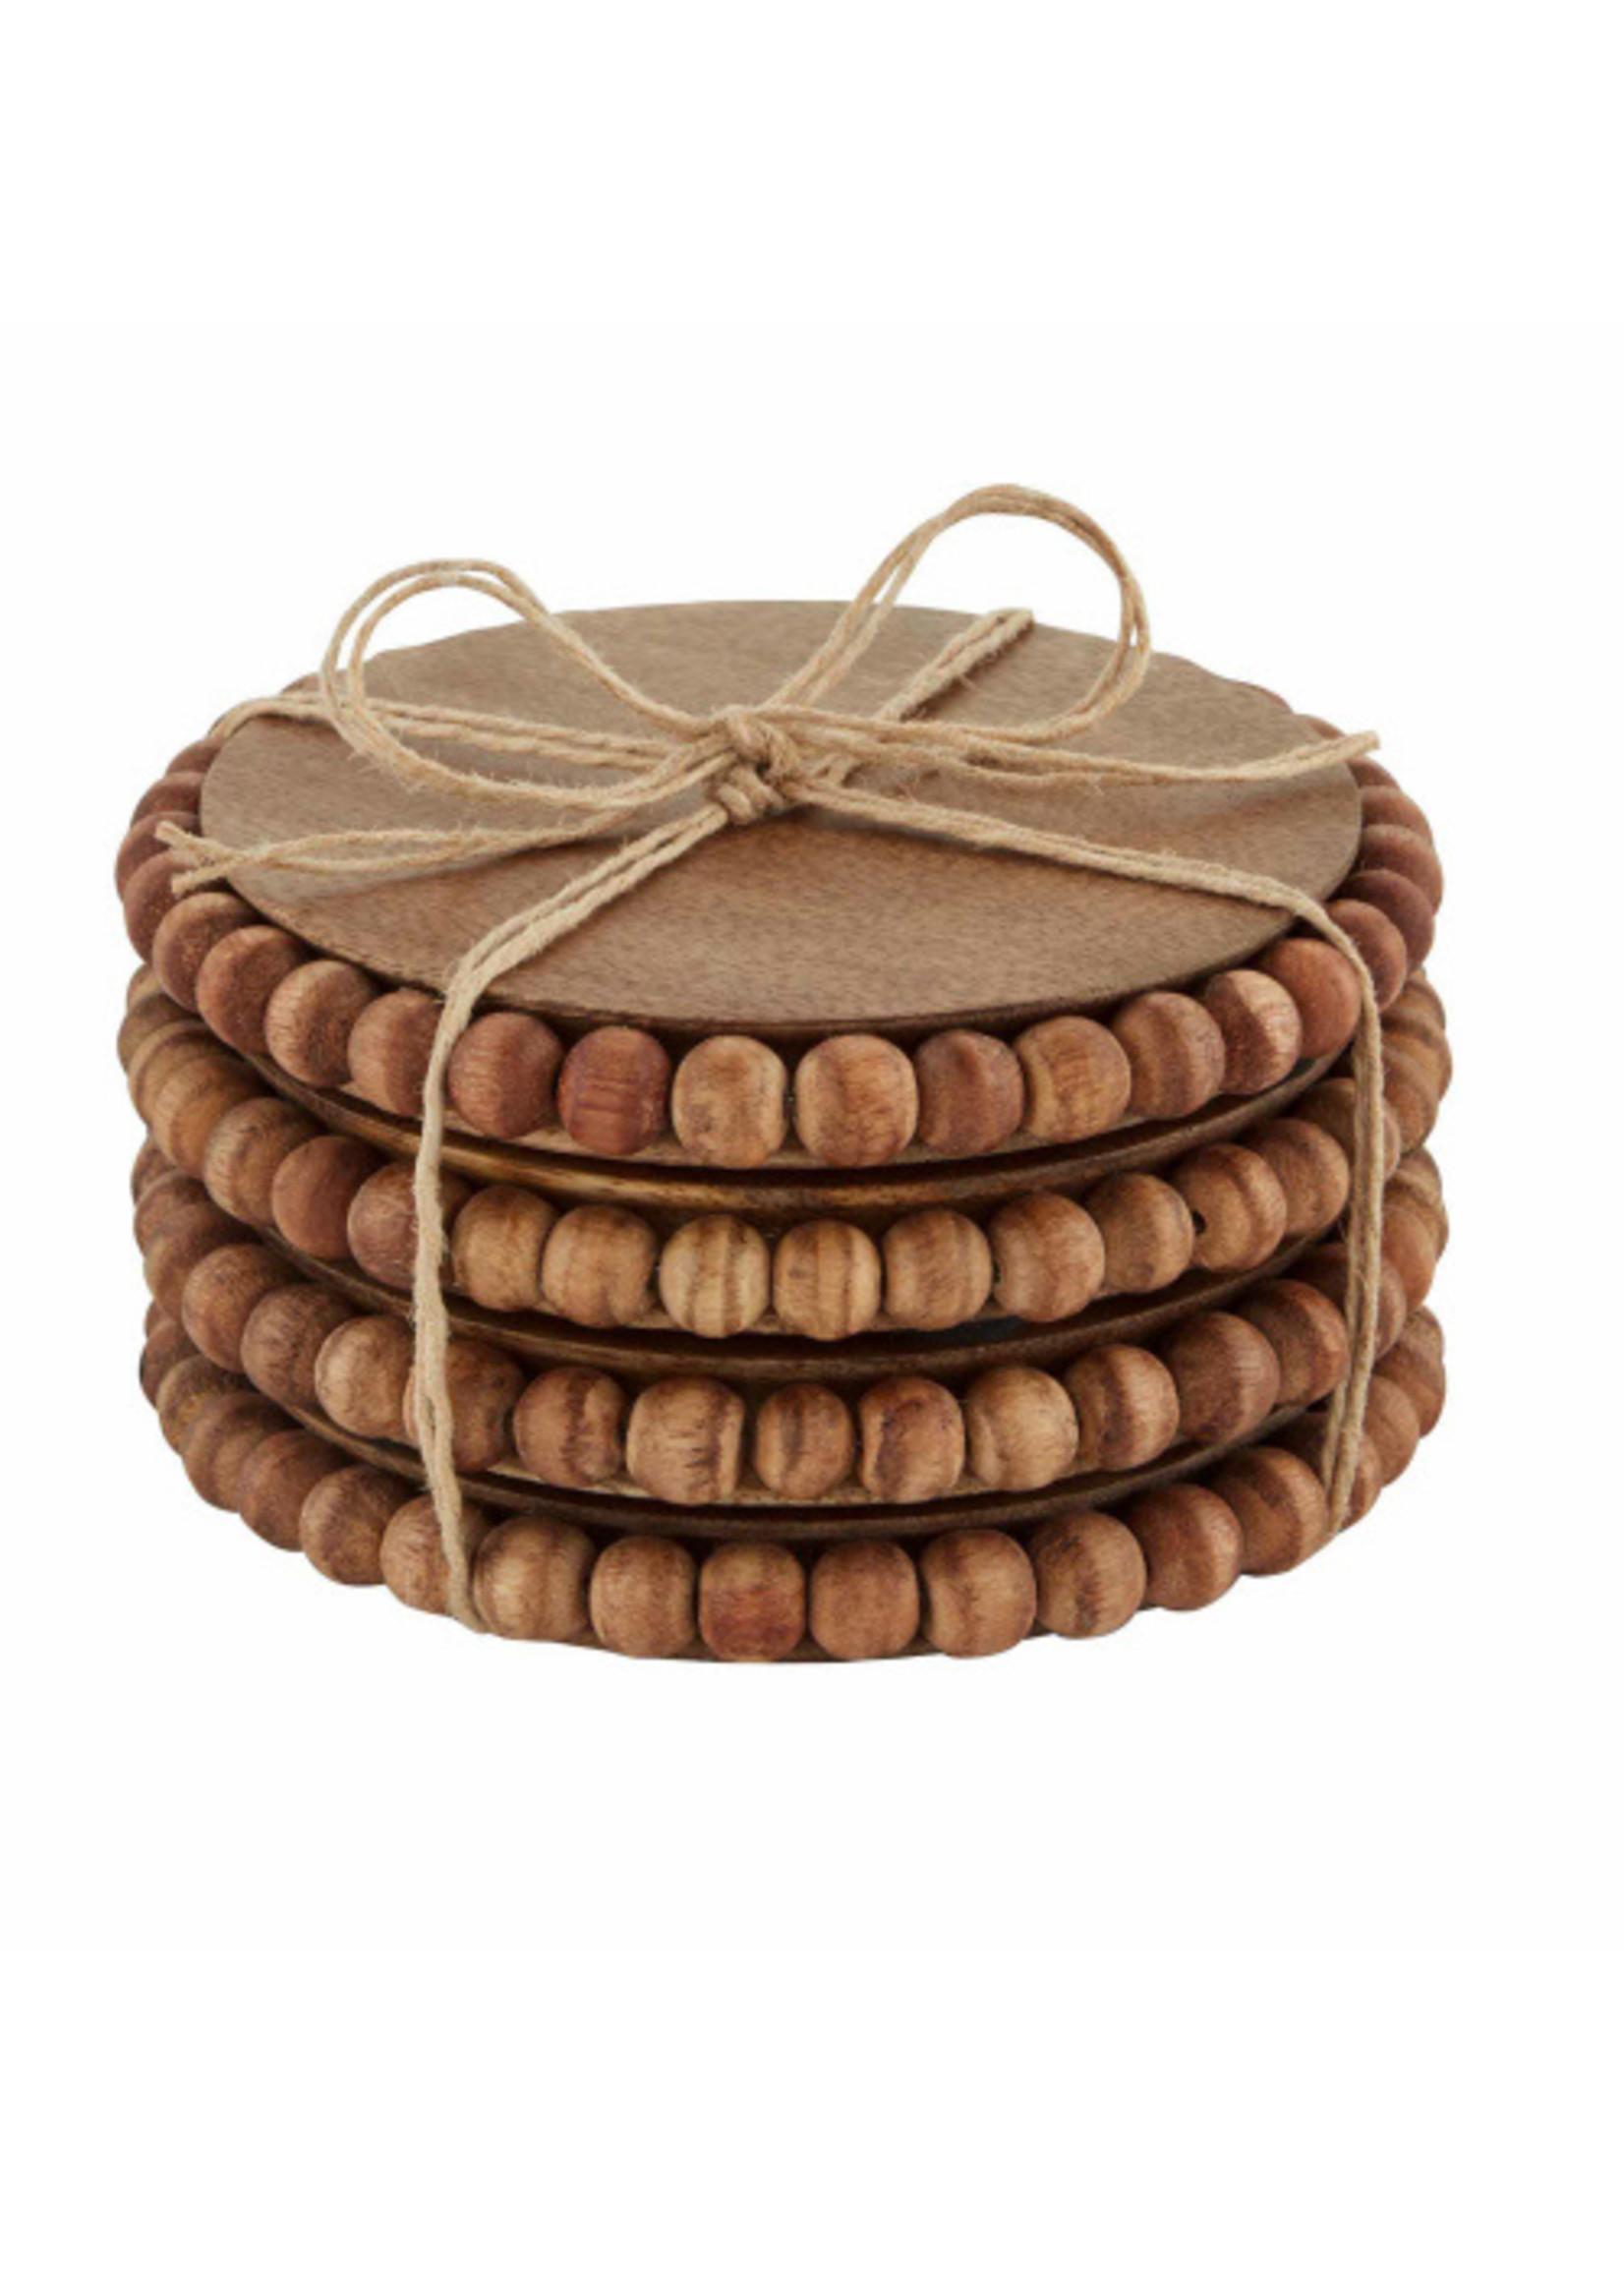 Beaded Wood Coasters